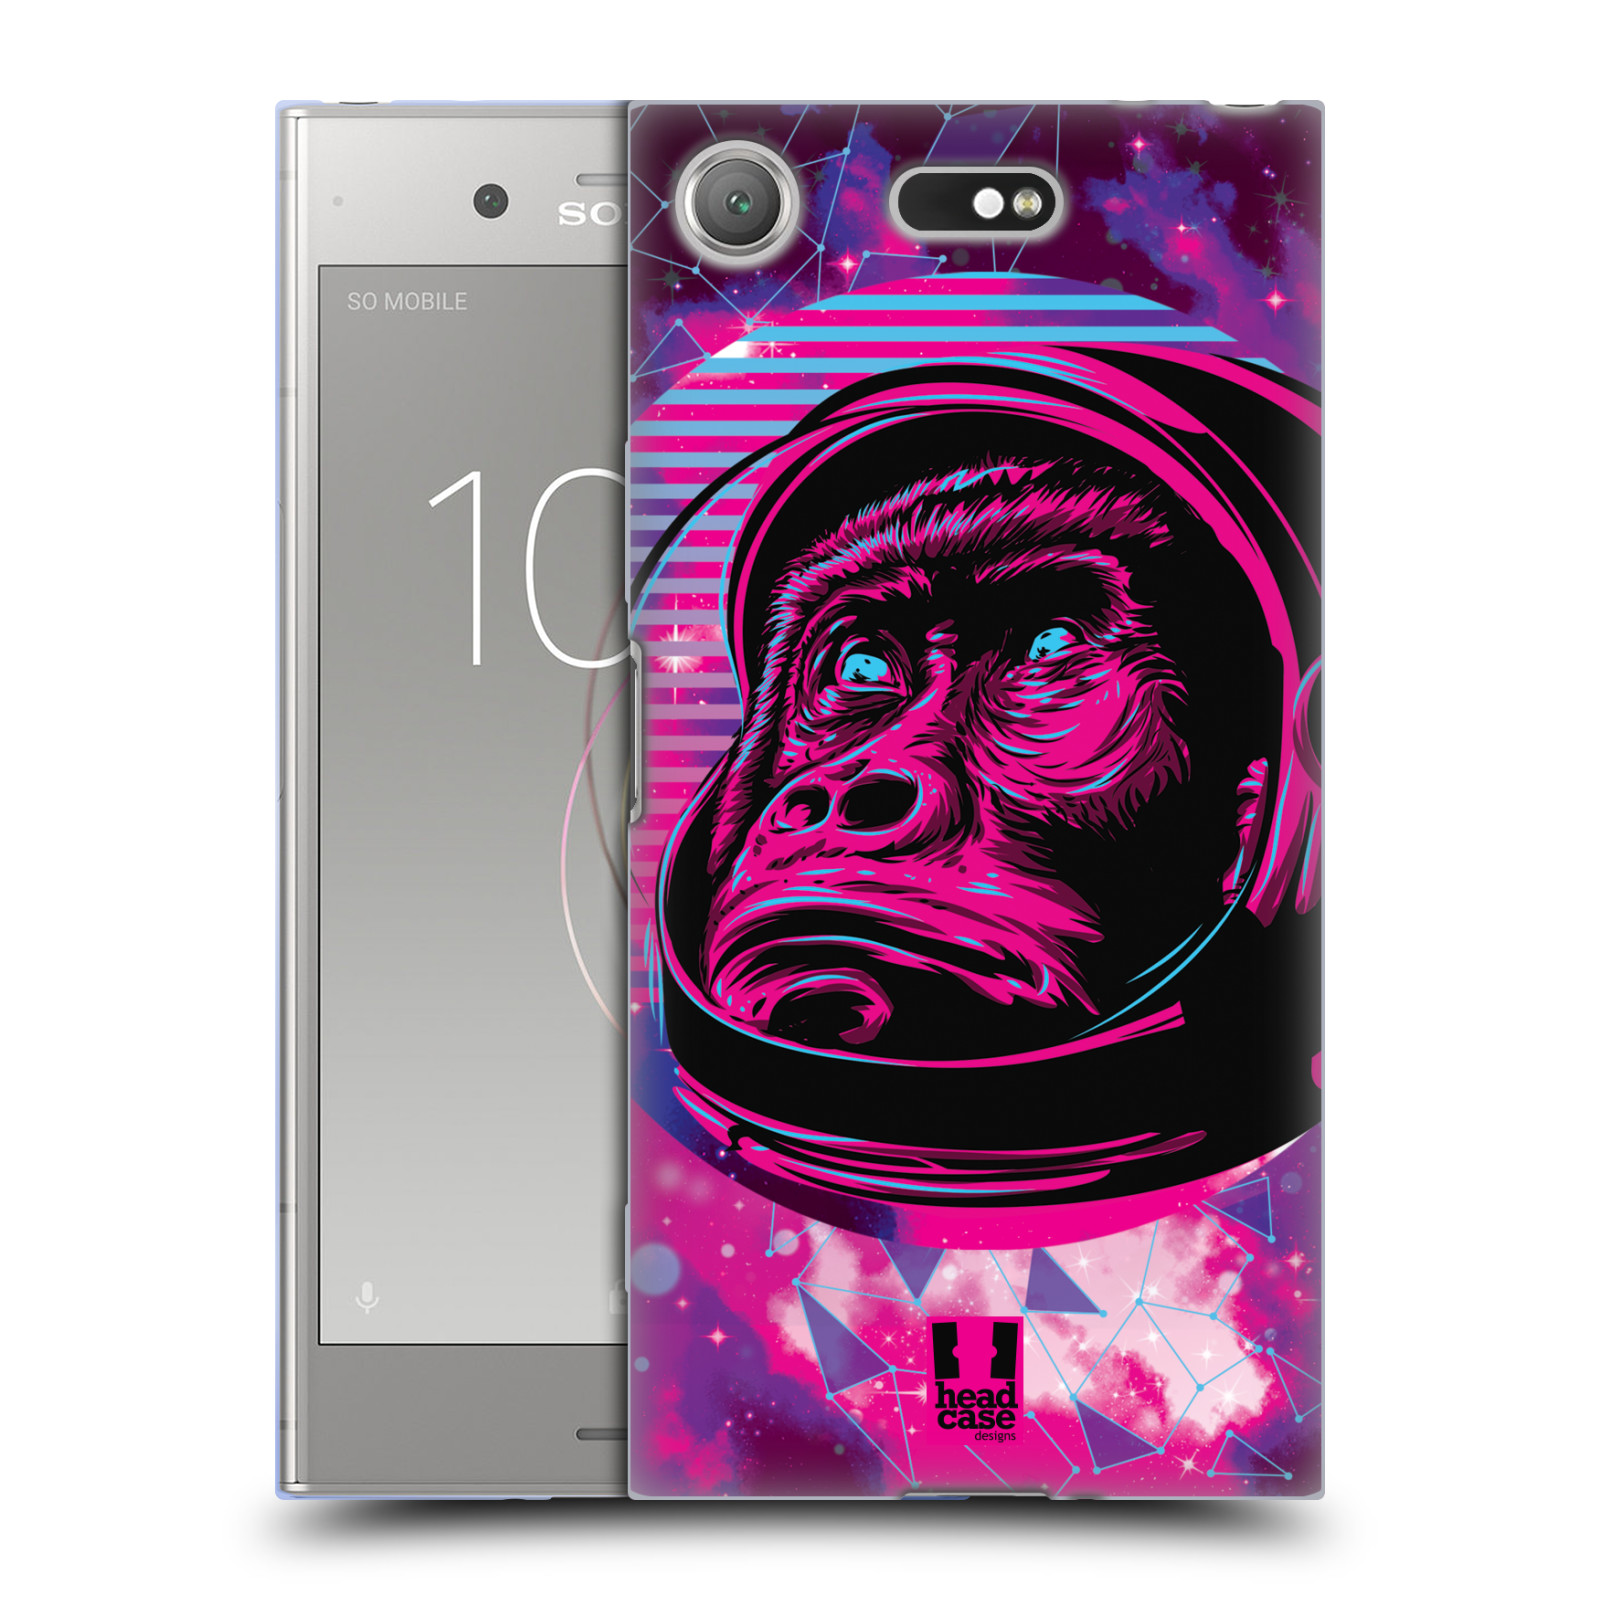 Silikonové pouzdro na mobil Sony Xperia XZ1 Compact - Head Case - Gorila ve skafandru